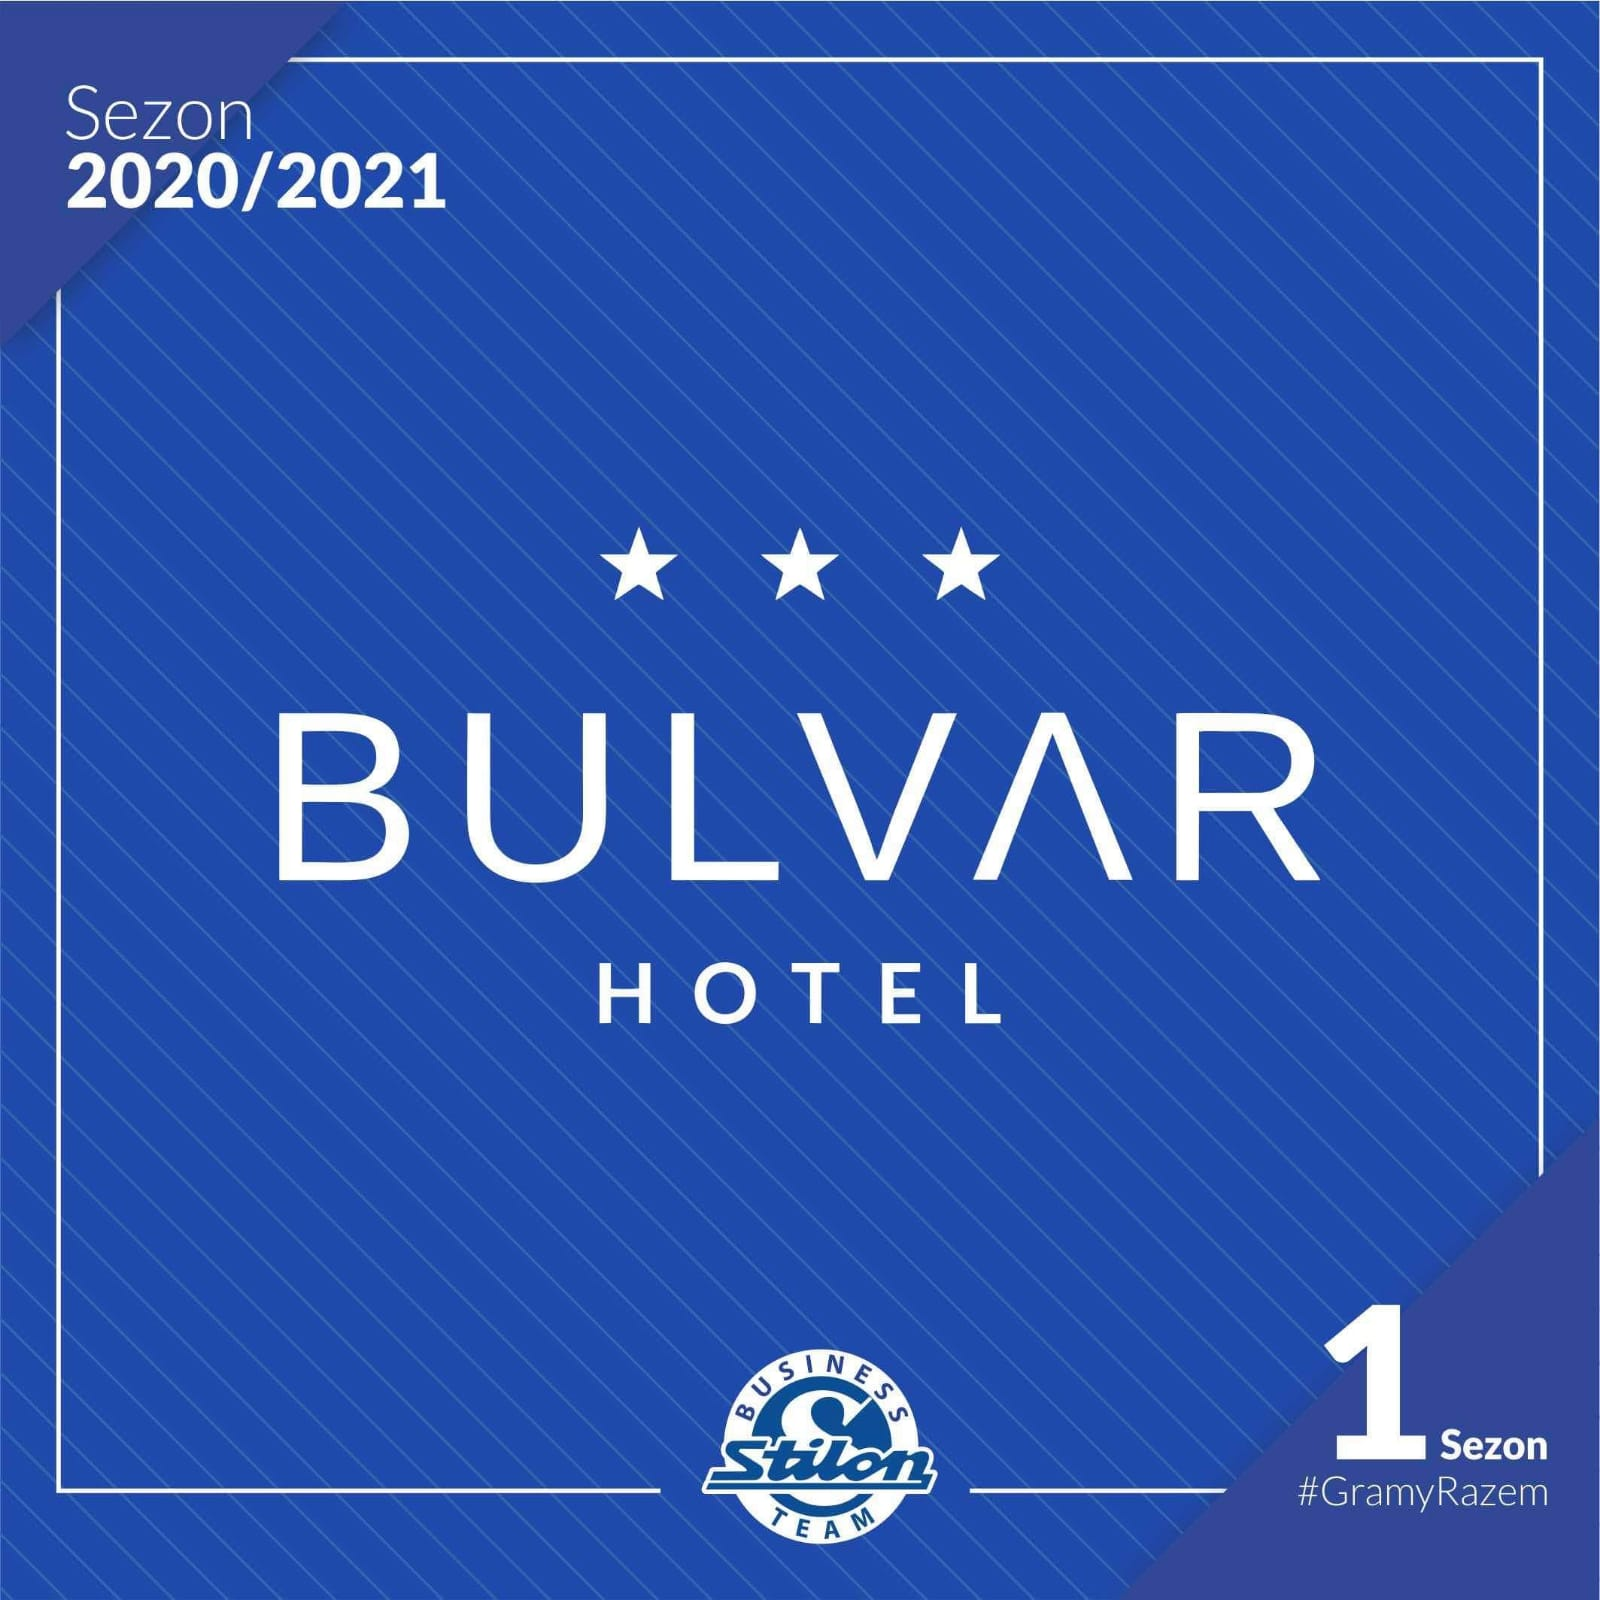 https://stilon.gorzow.pl/wp-content/uploads/2020/09/Bulvar.jpeg